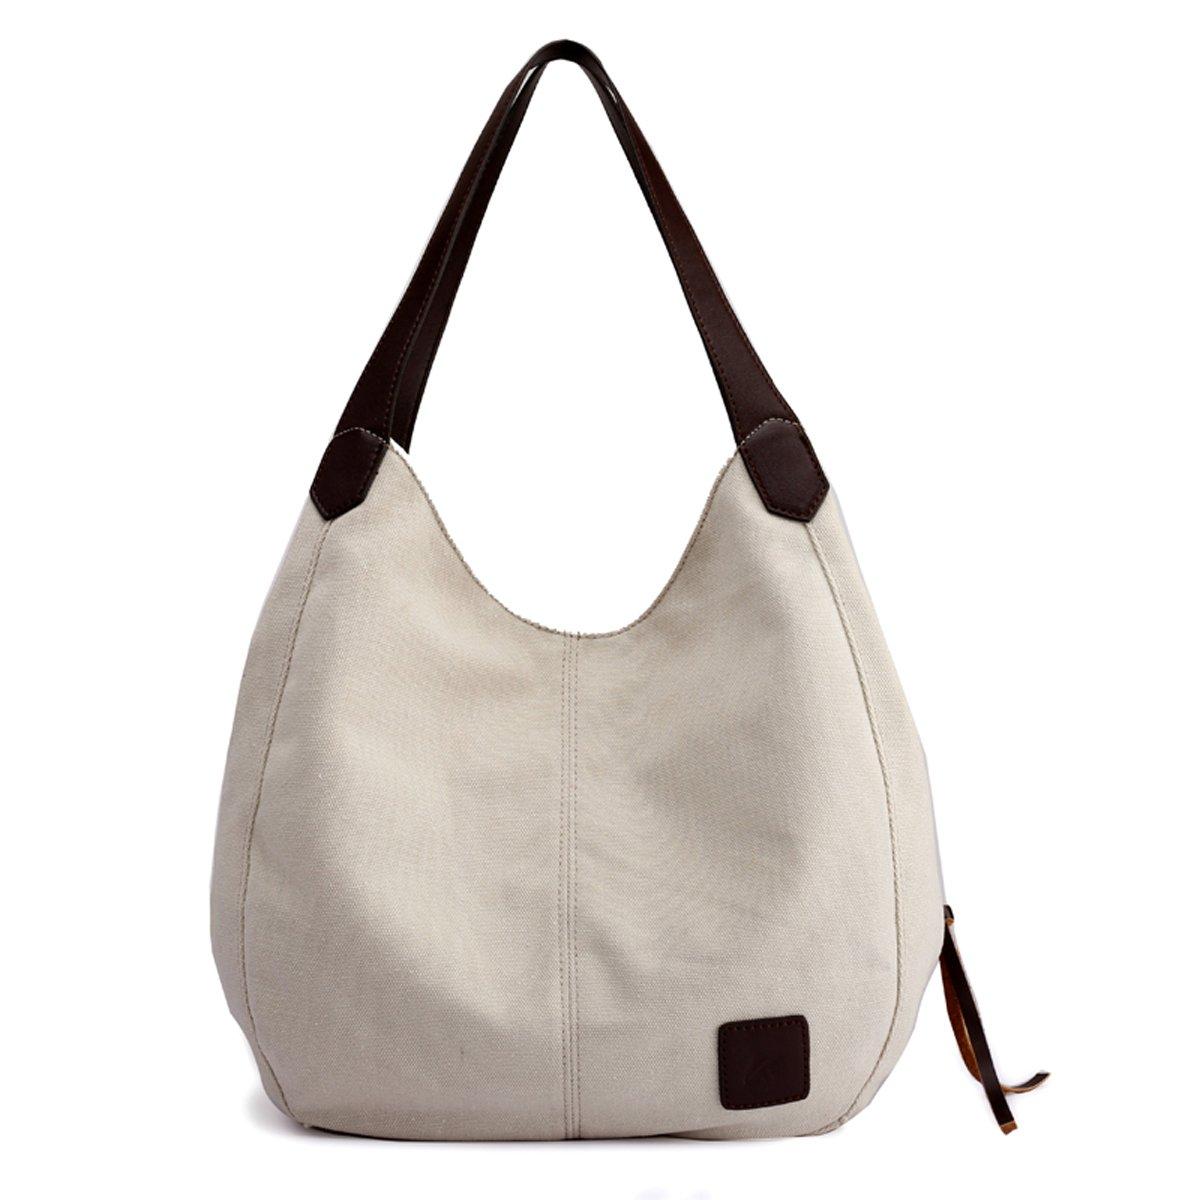 8ff6eead6e Amazon.com  Hiigoo Fashion Women s Multi-pocket Cotton Canvas Handbags  Shoulder Bags Totes Purses (Beige)  Shoes